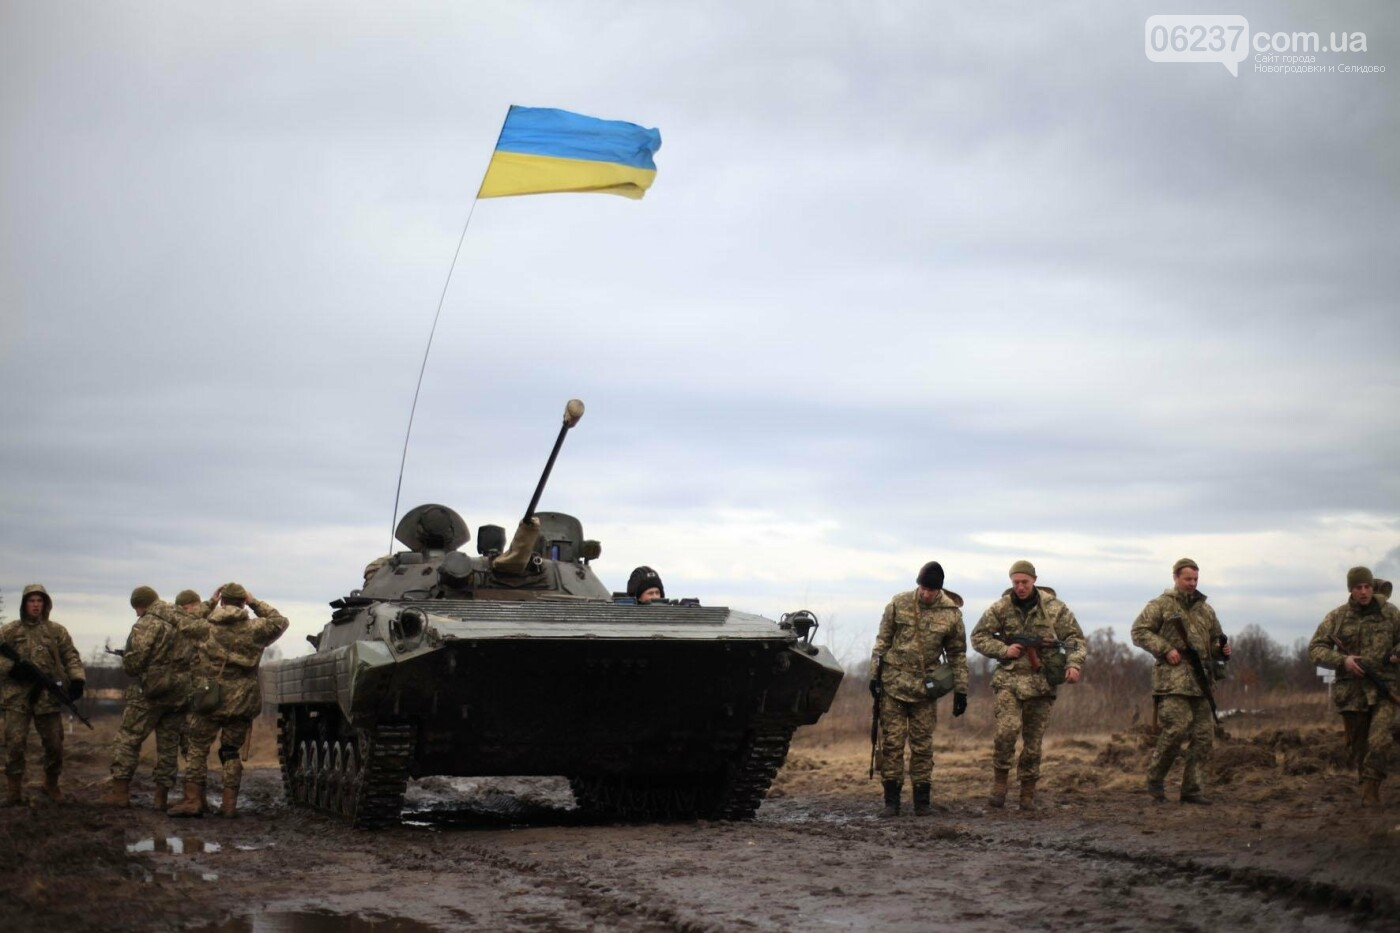 В ООН назвали число погибших с начала конфликта на Донбассе, фото-1